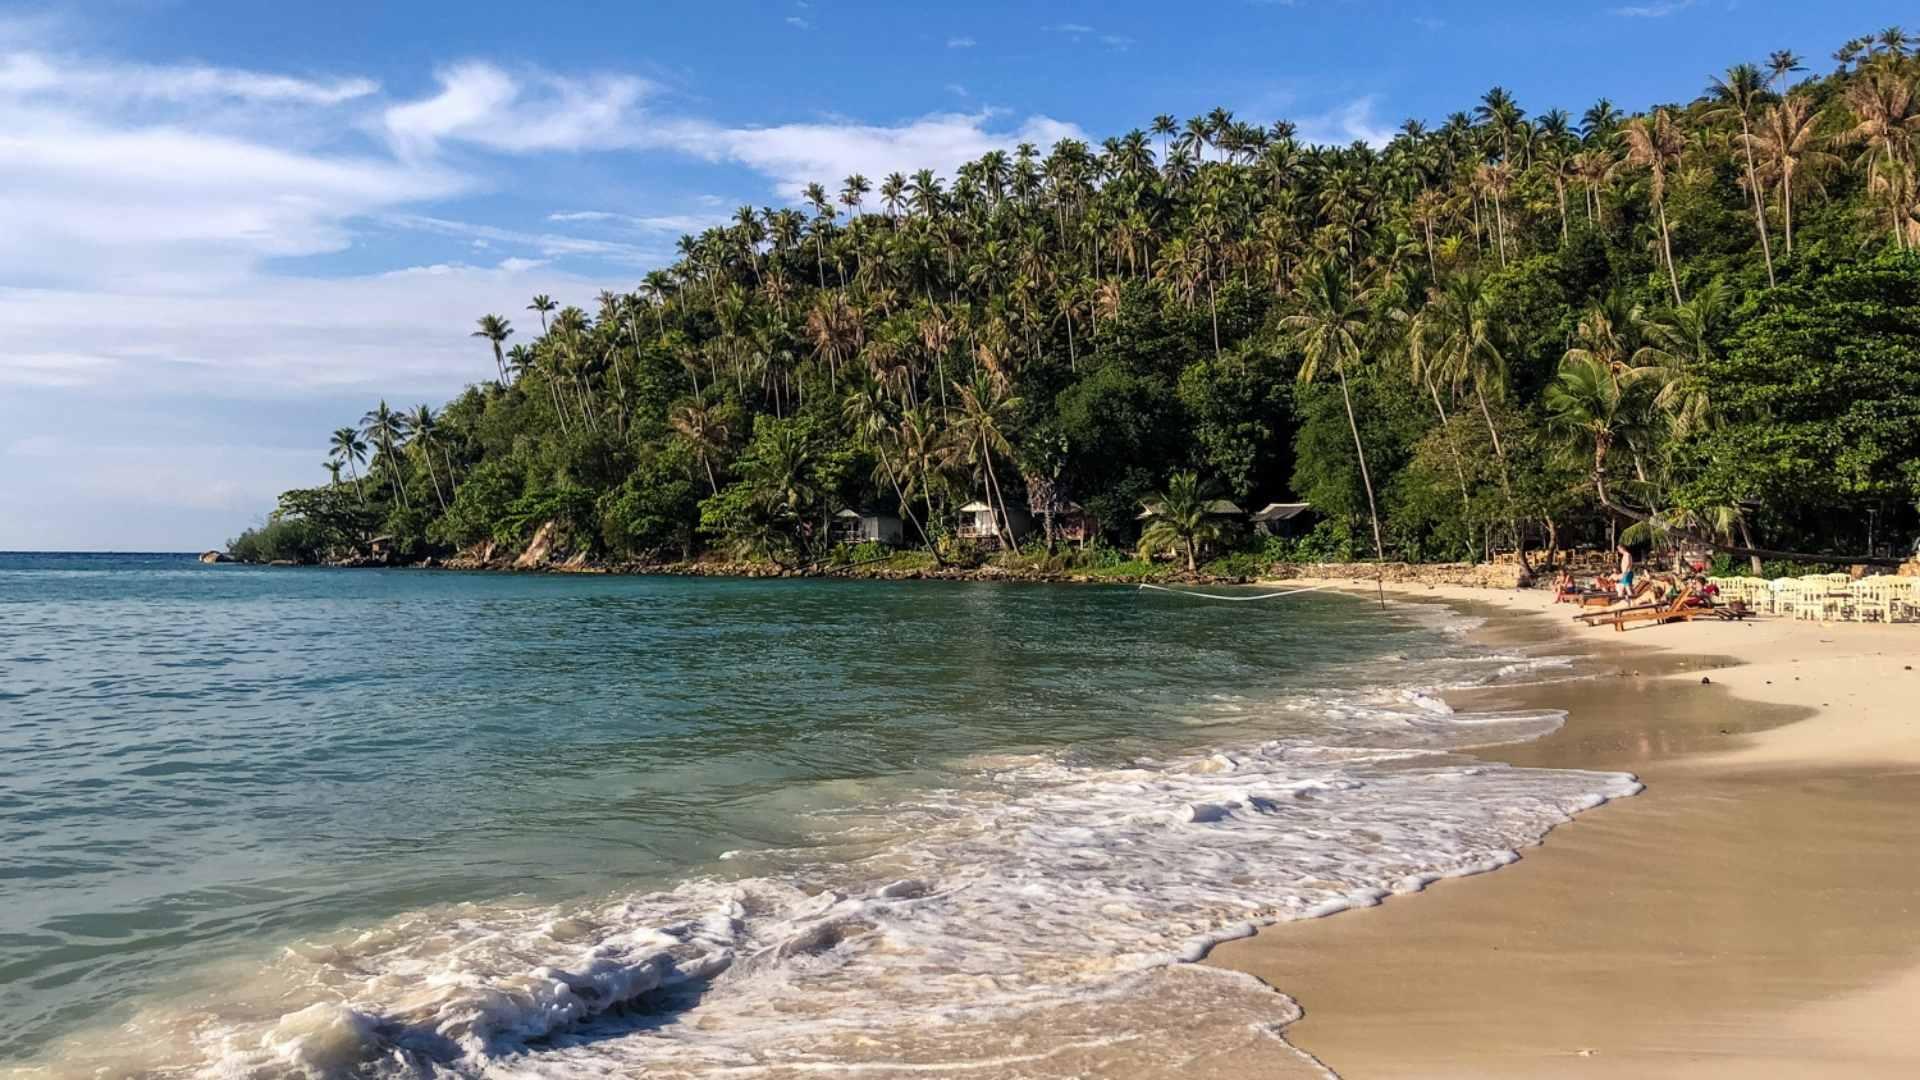 Koh Phangan, Thailand - scenic islands